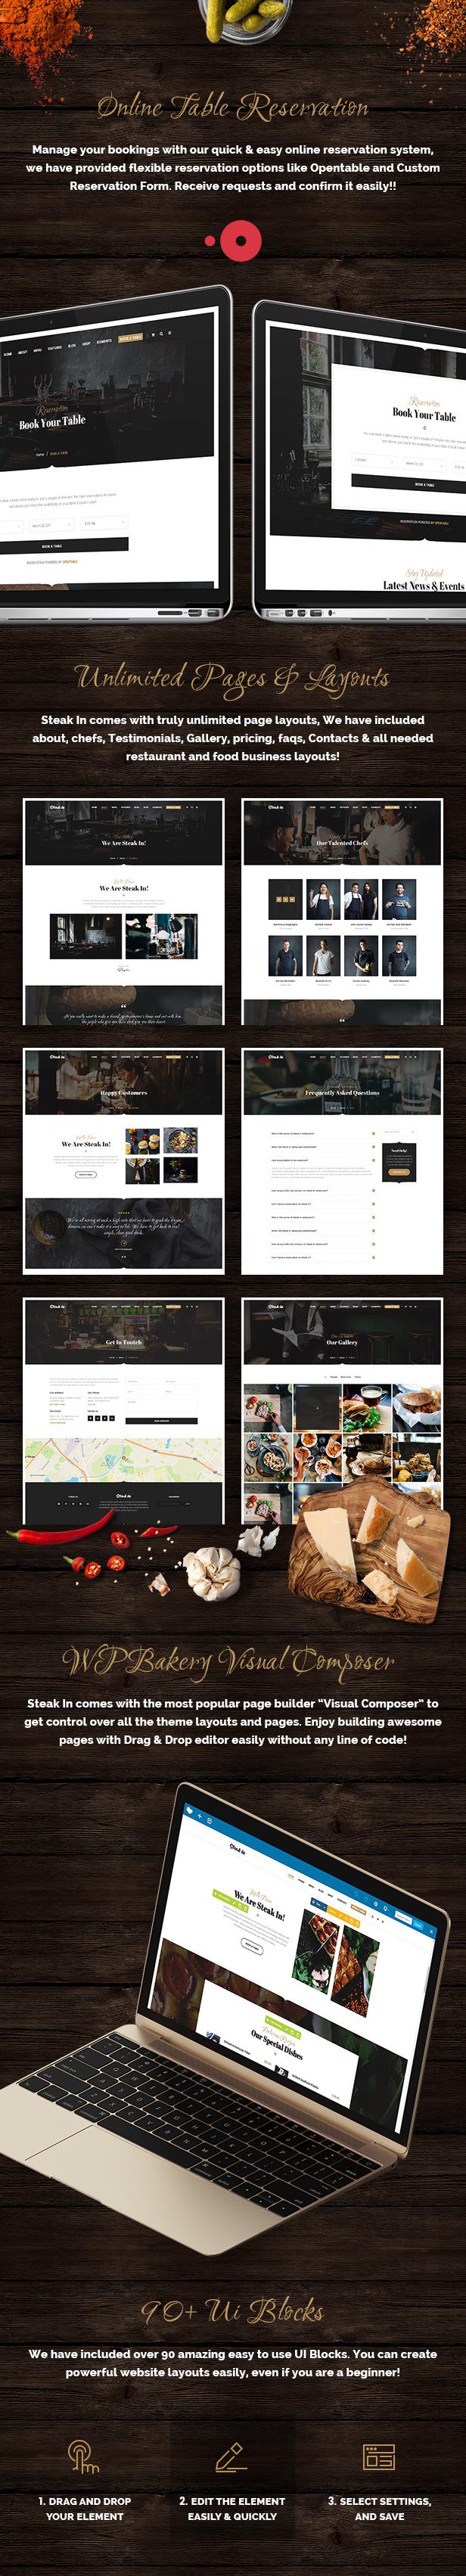 Steak In - Restaurant & Cafe WordPress Theme - 4